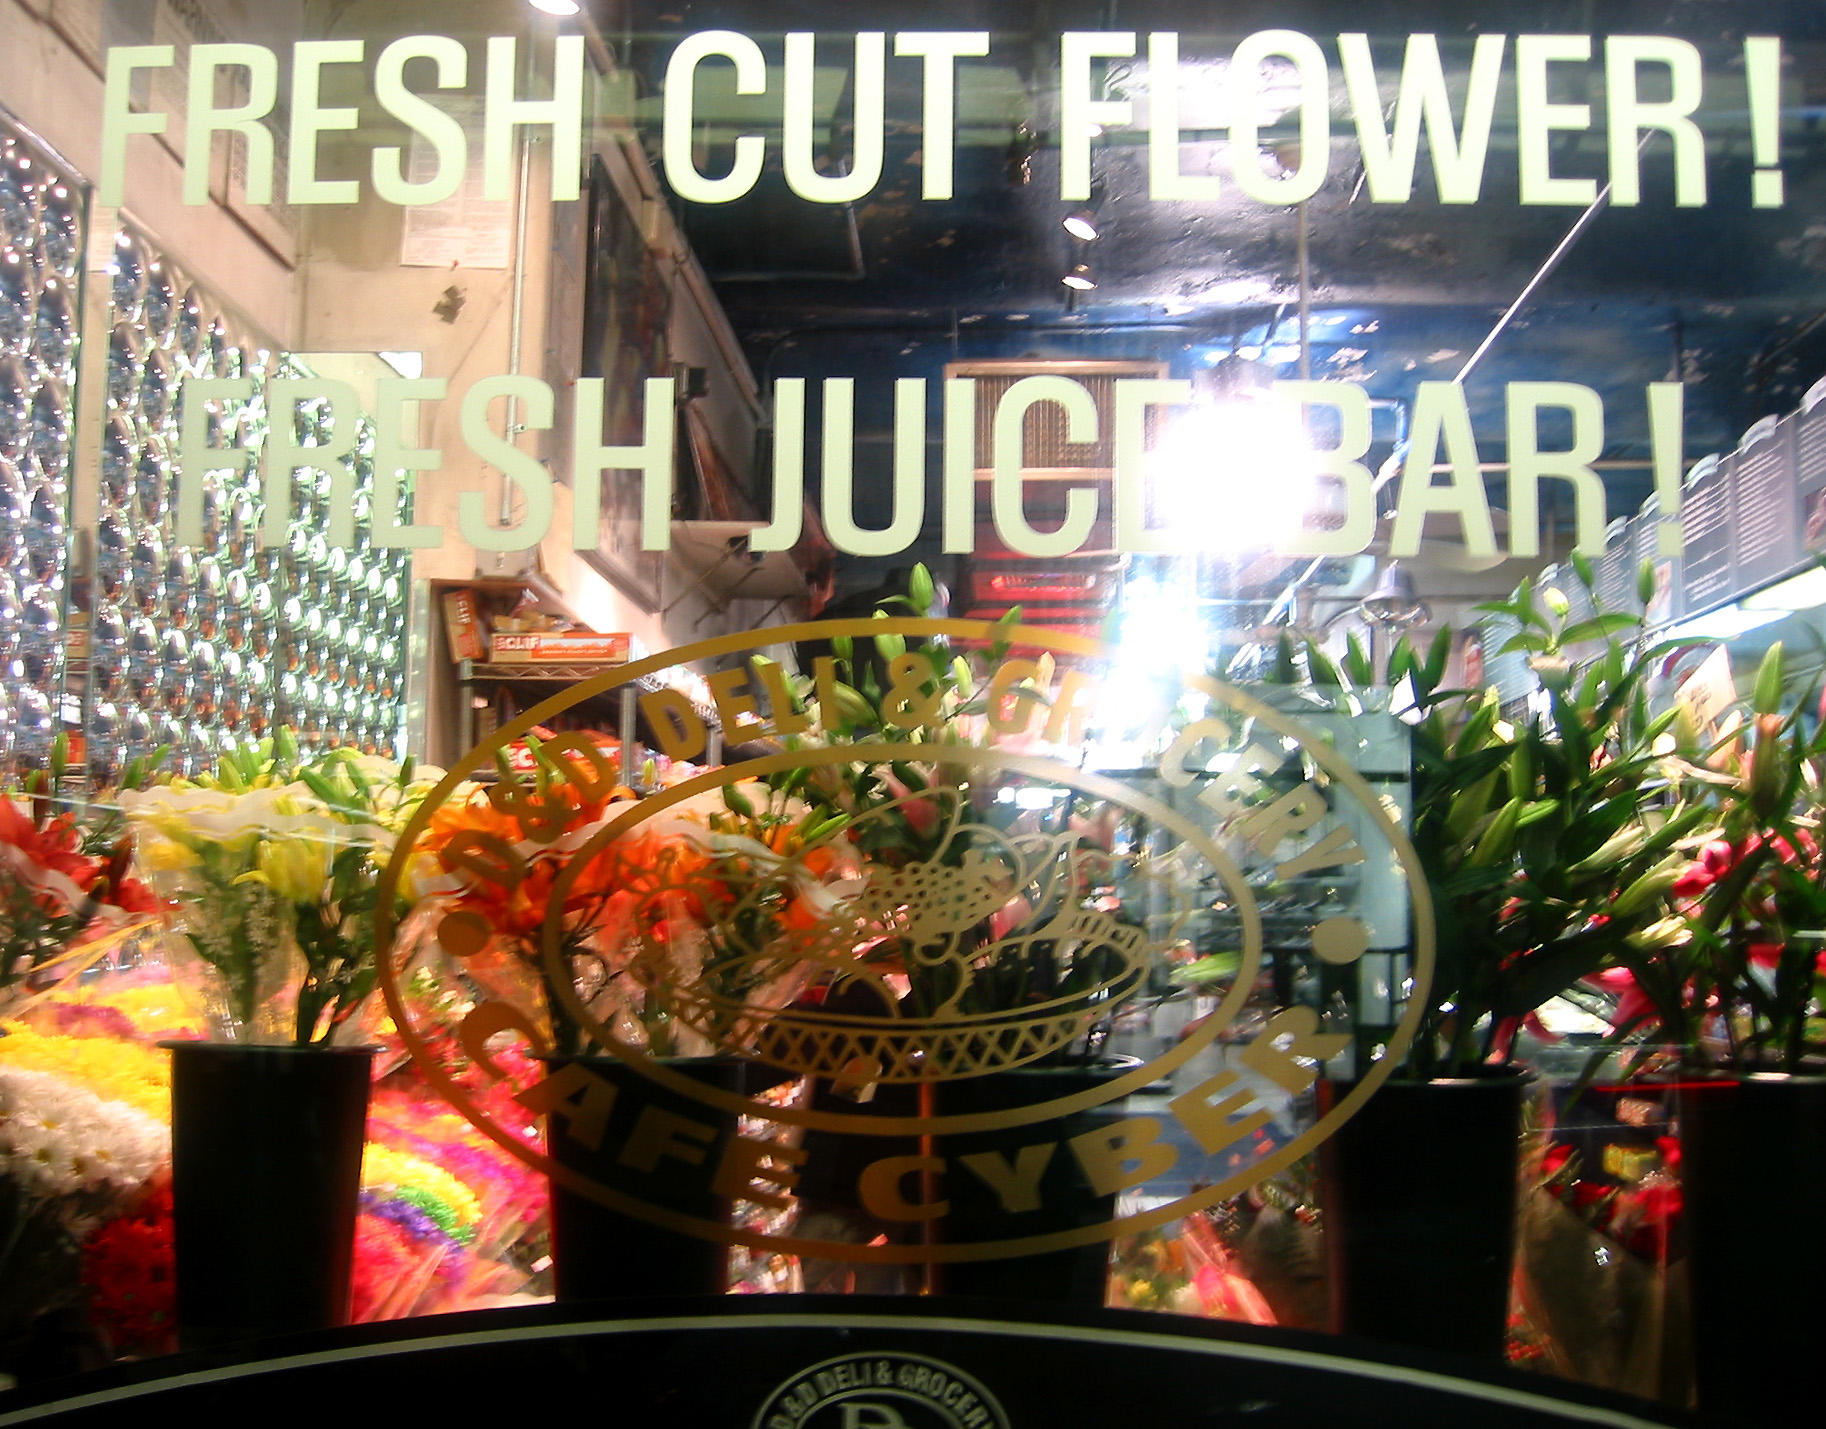 Refreshments & Flowers